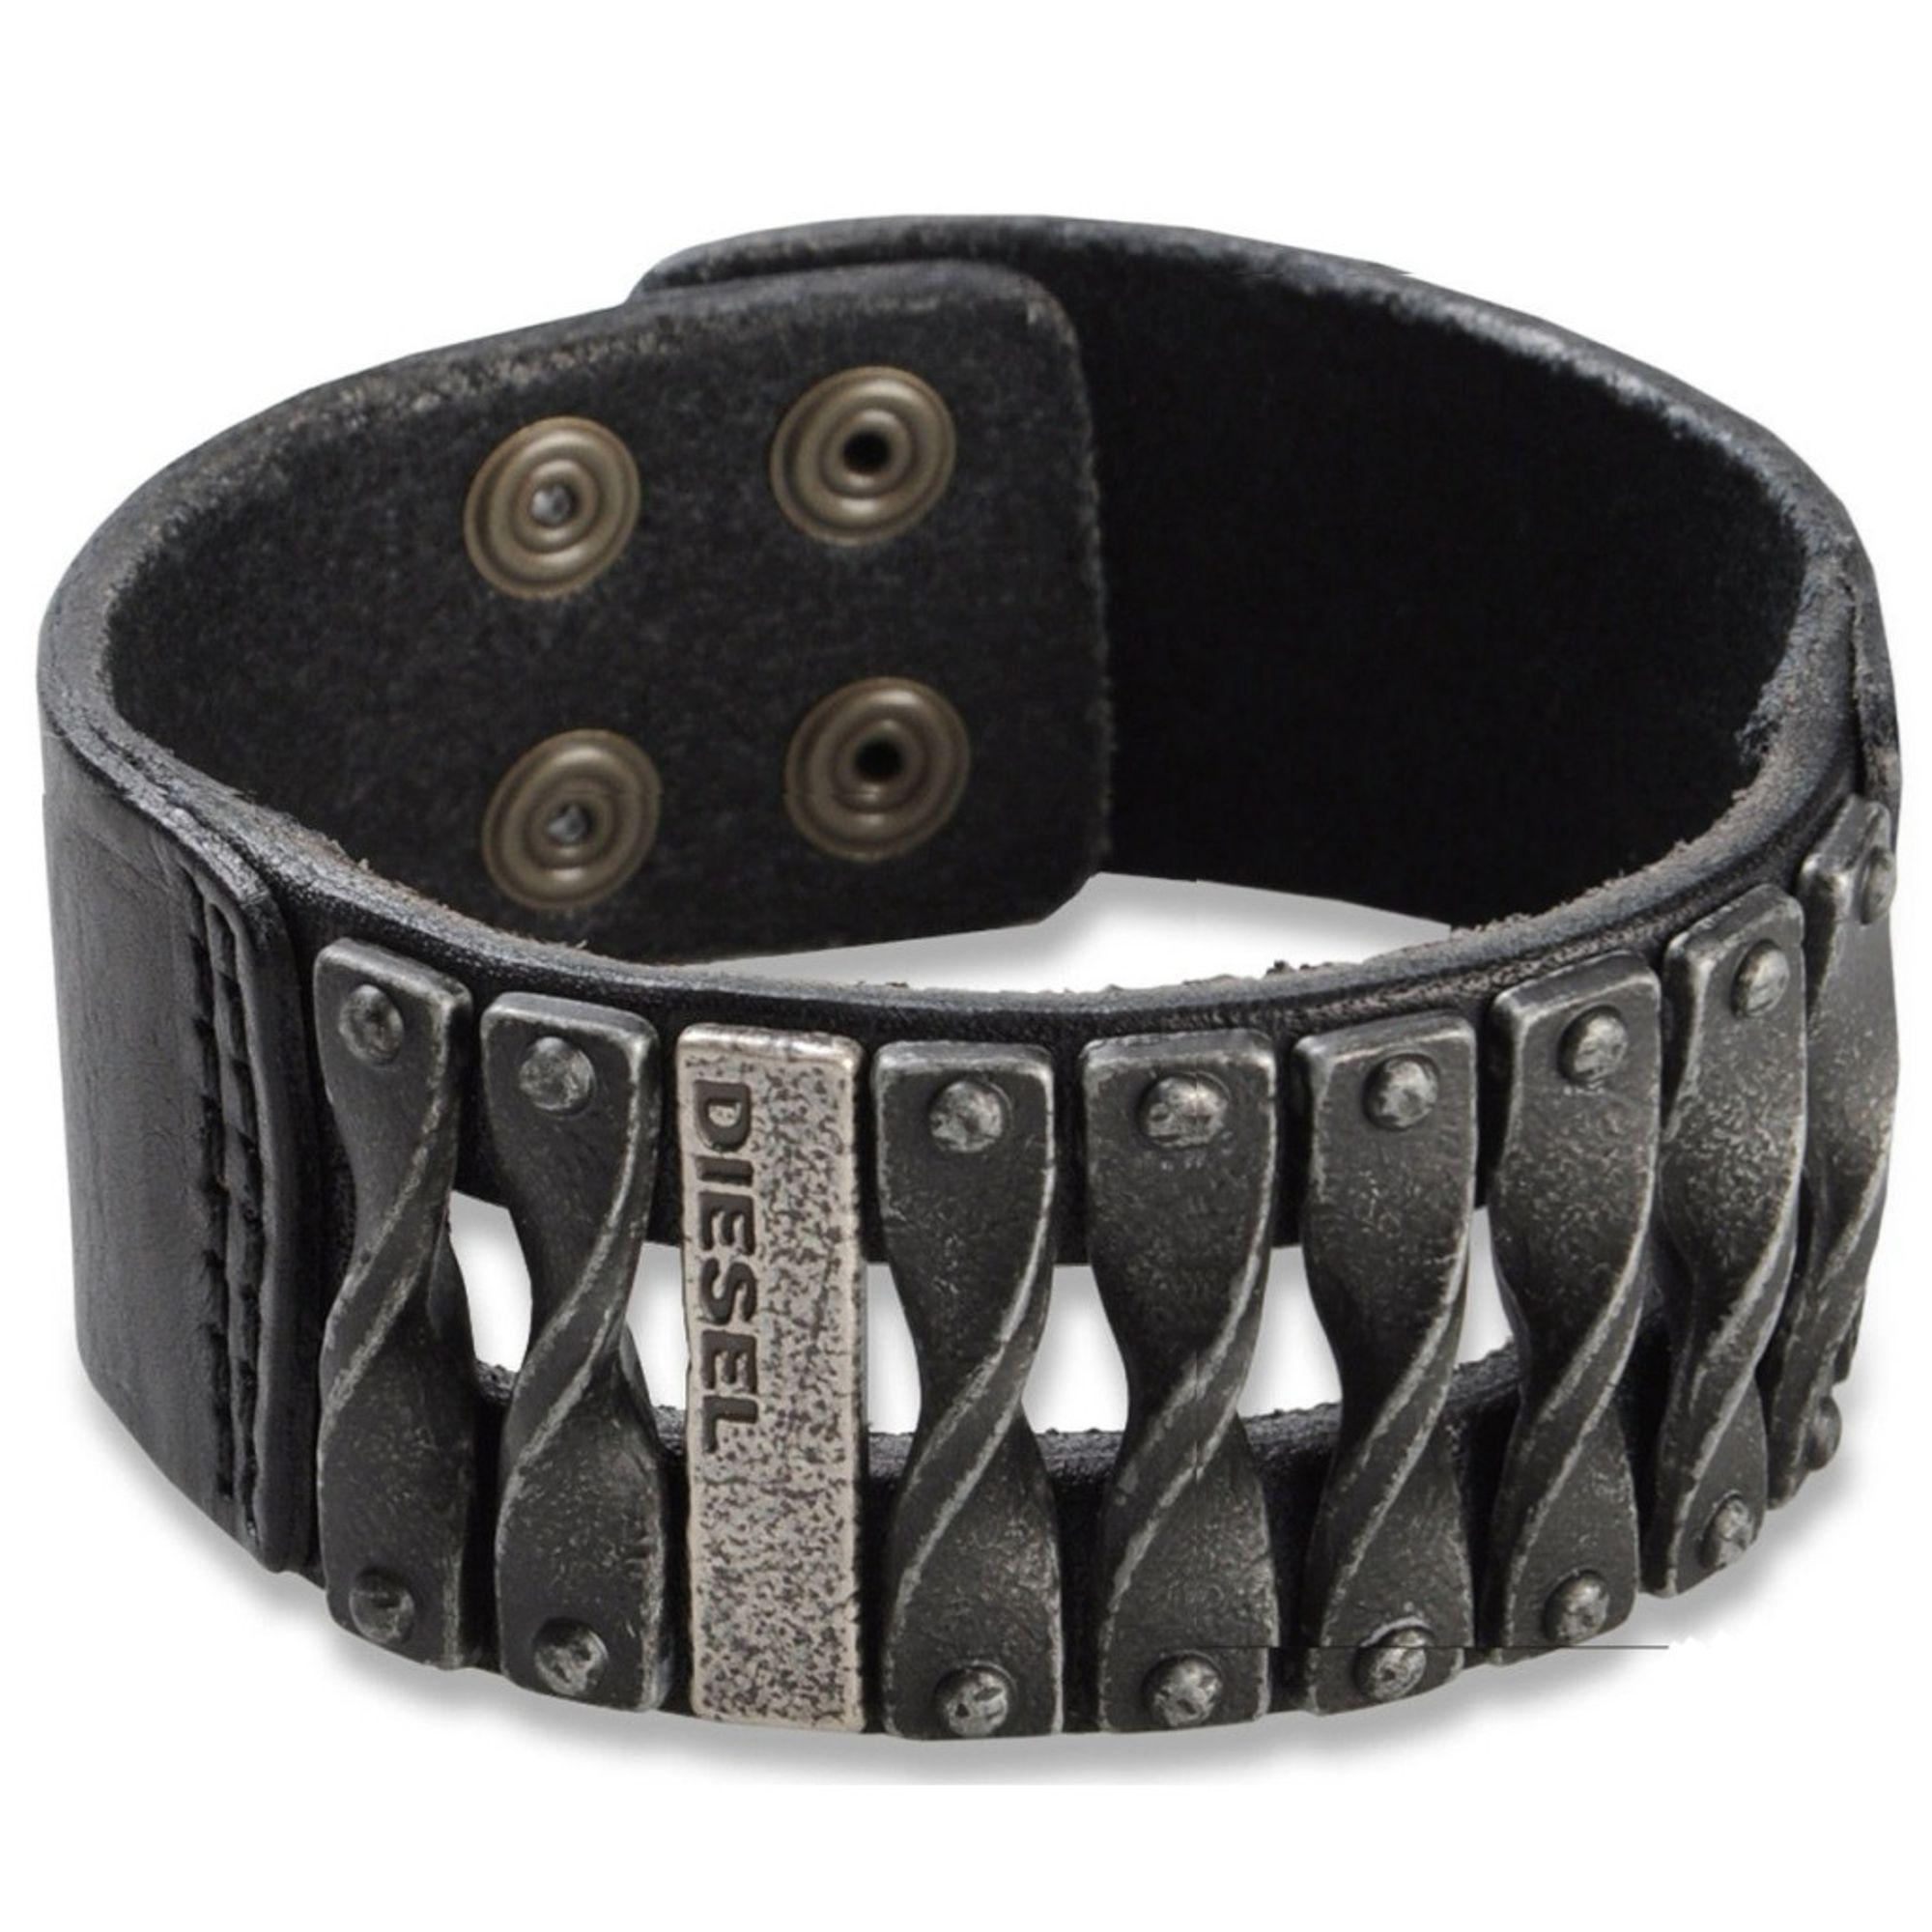 Diesel Herren Armband Leder Schwarz 22 cm